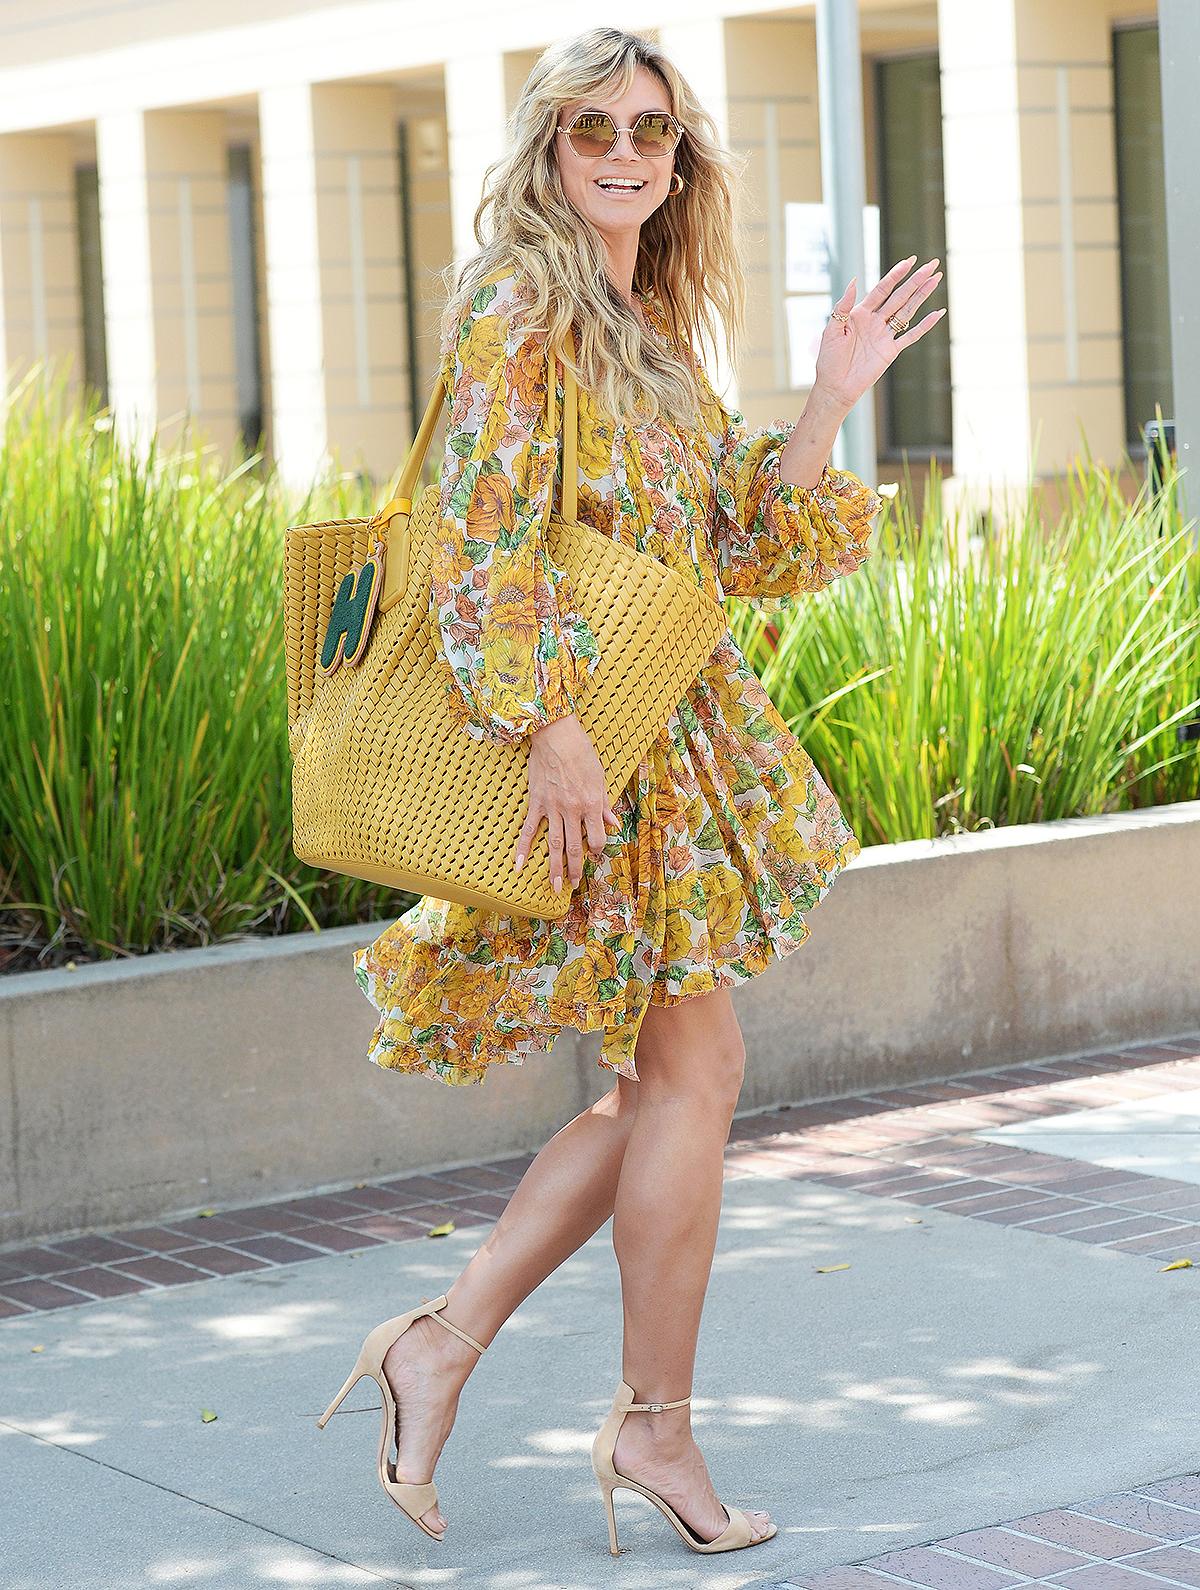 heidi-klum-yellow-dress1